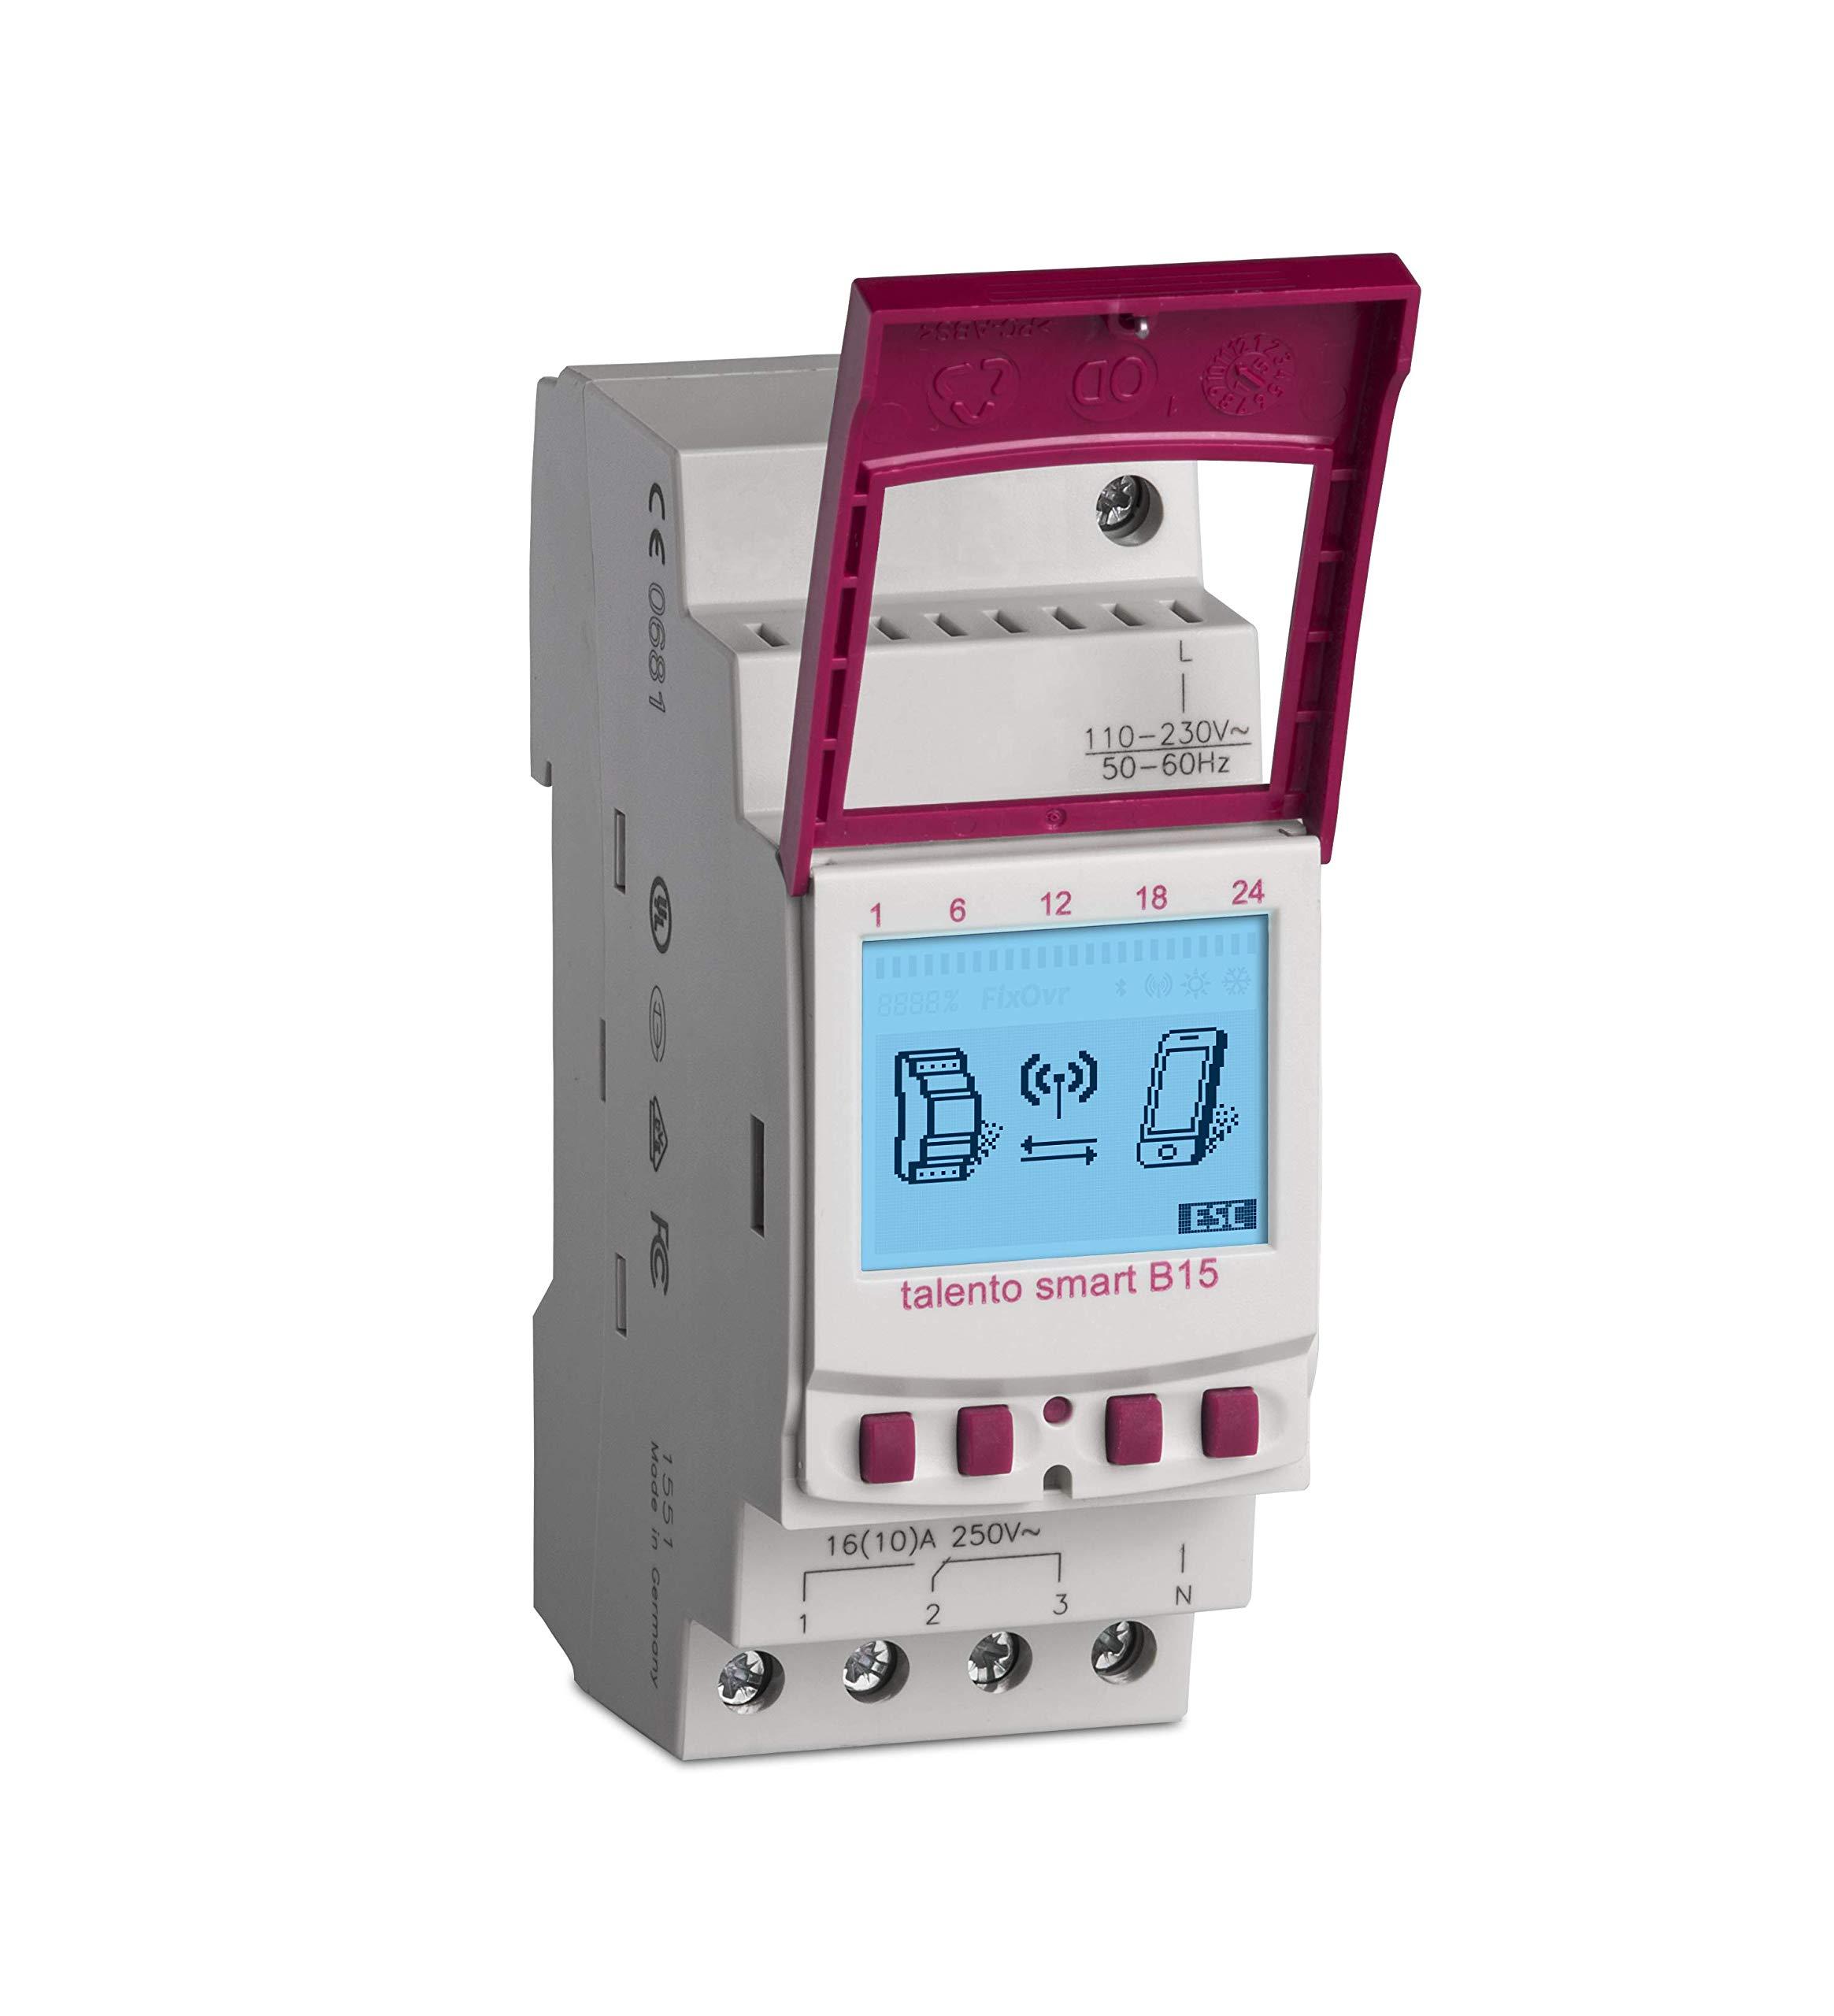 Grässlin talento smart B15 - 43.02.0001.1 - Digital Switch with Wireless Bluetooth 4 Connectivity - 1 channel - DIN Rail…